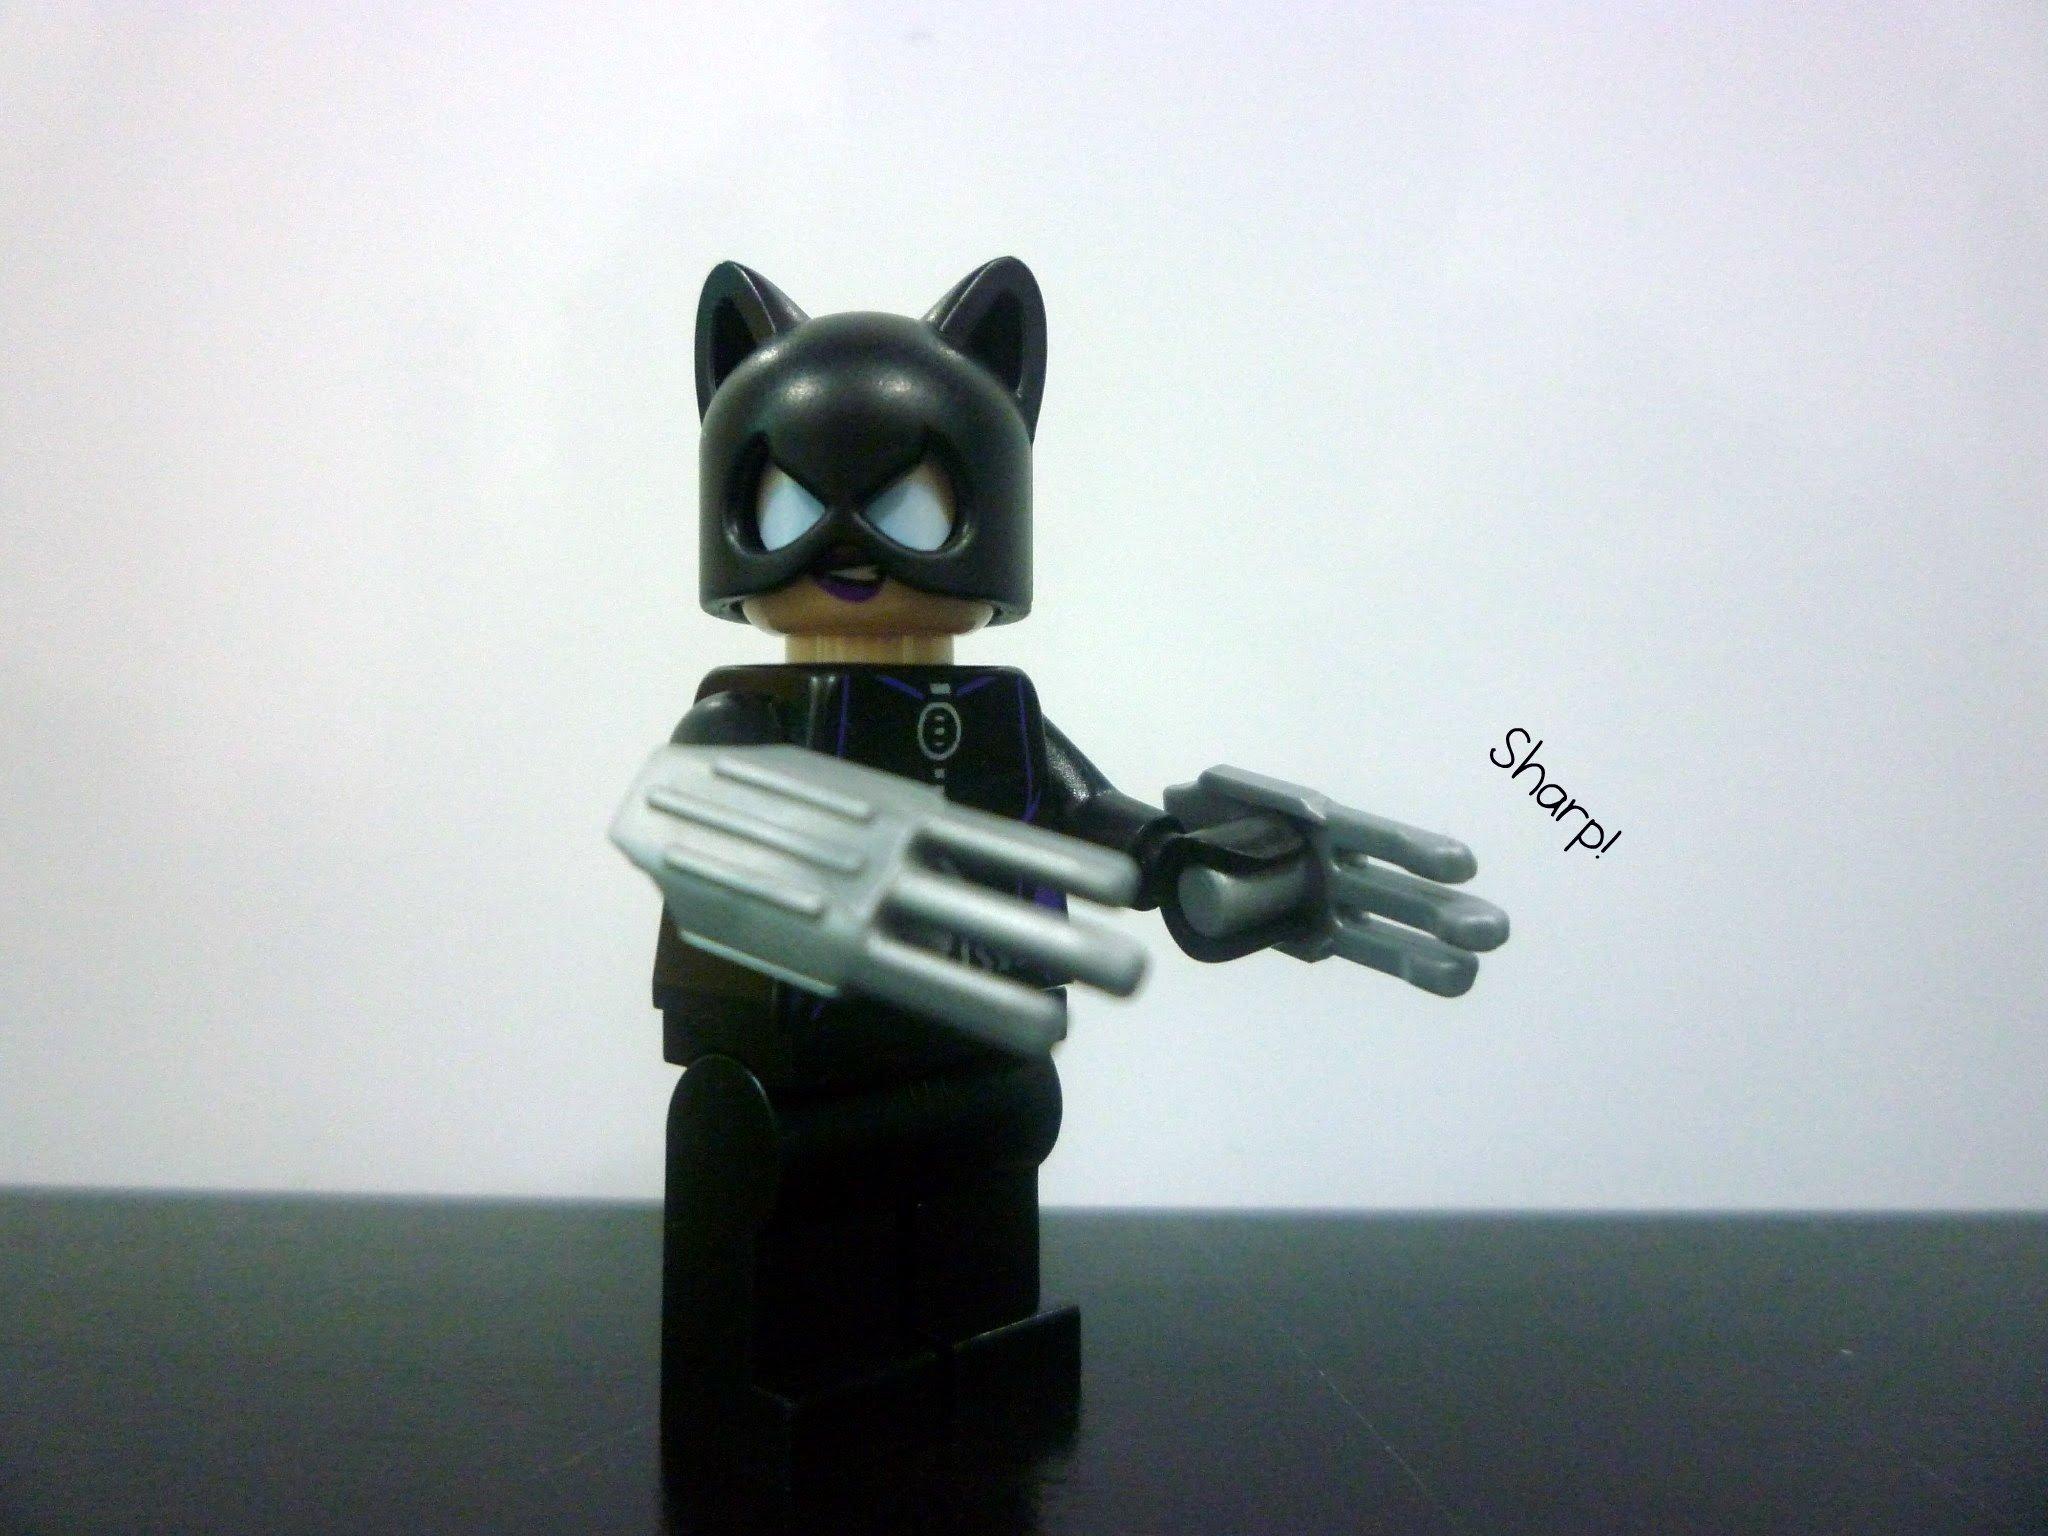 Lego CATWOMAN minifigure 6858 Catcycle city chase BATMAN minifig DC Super Hero